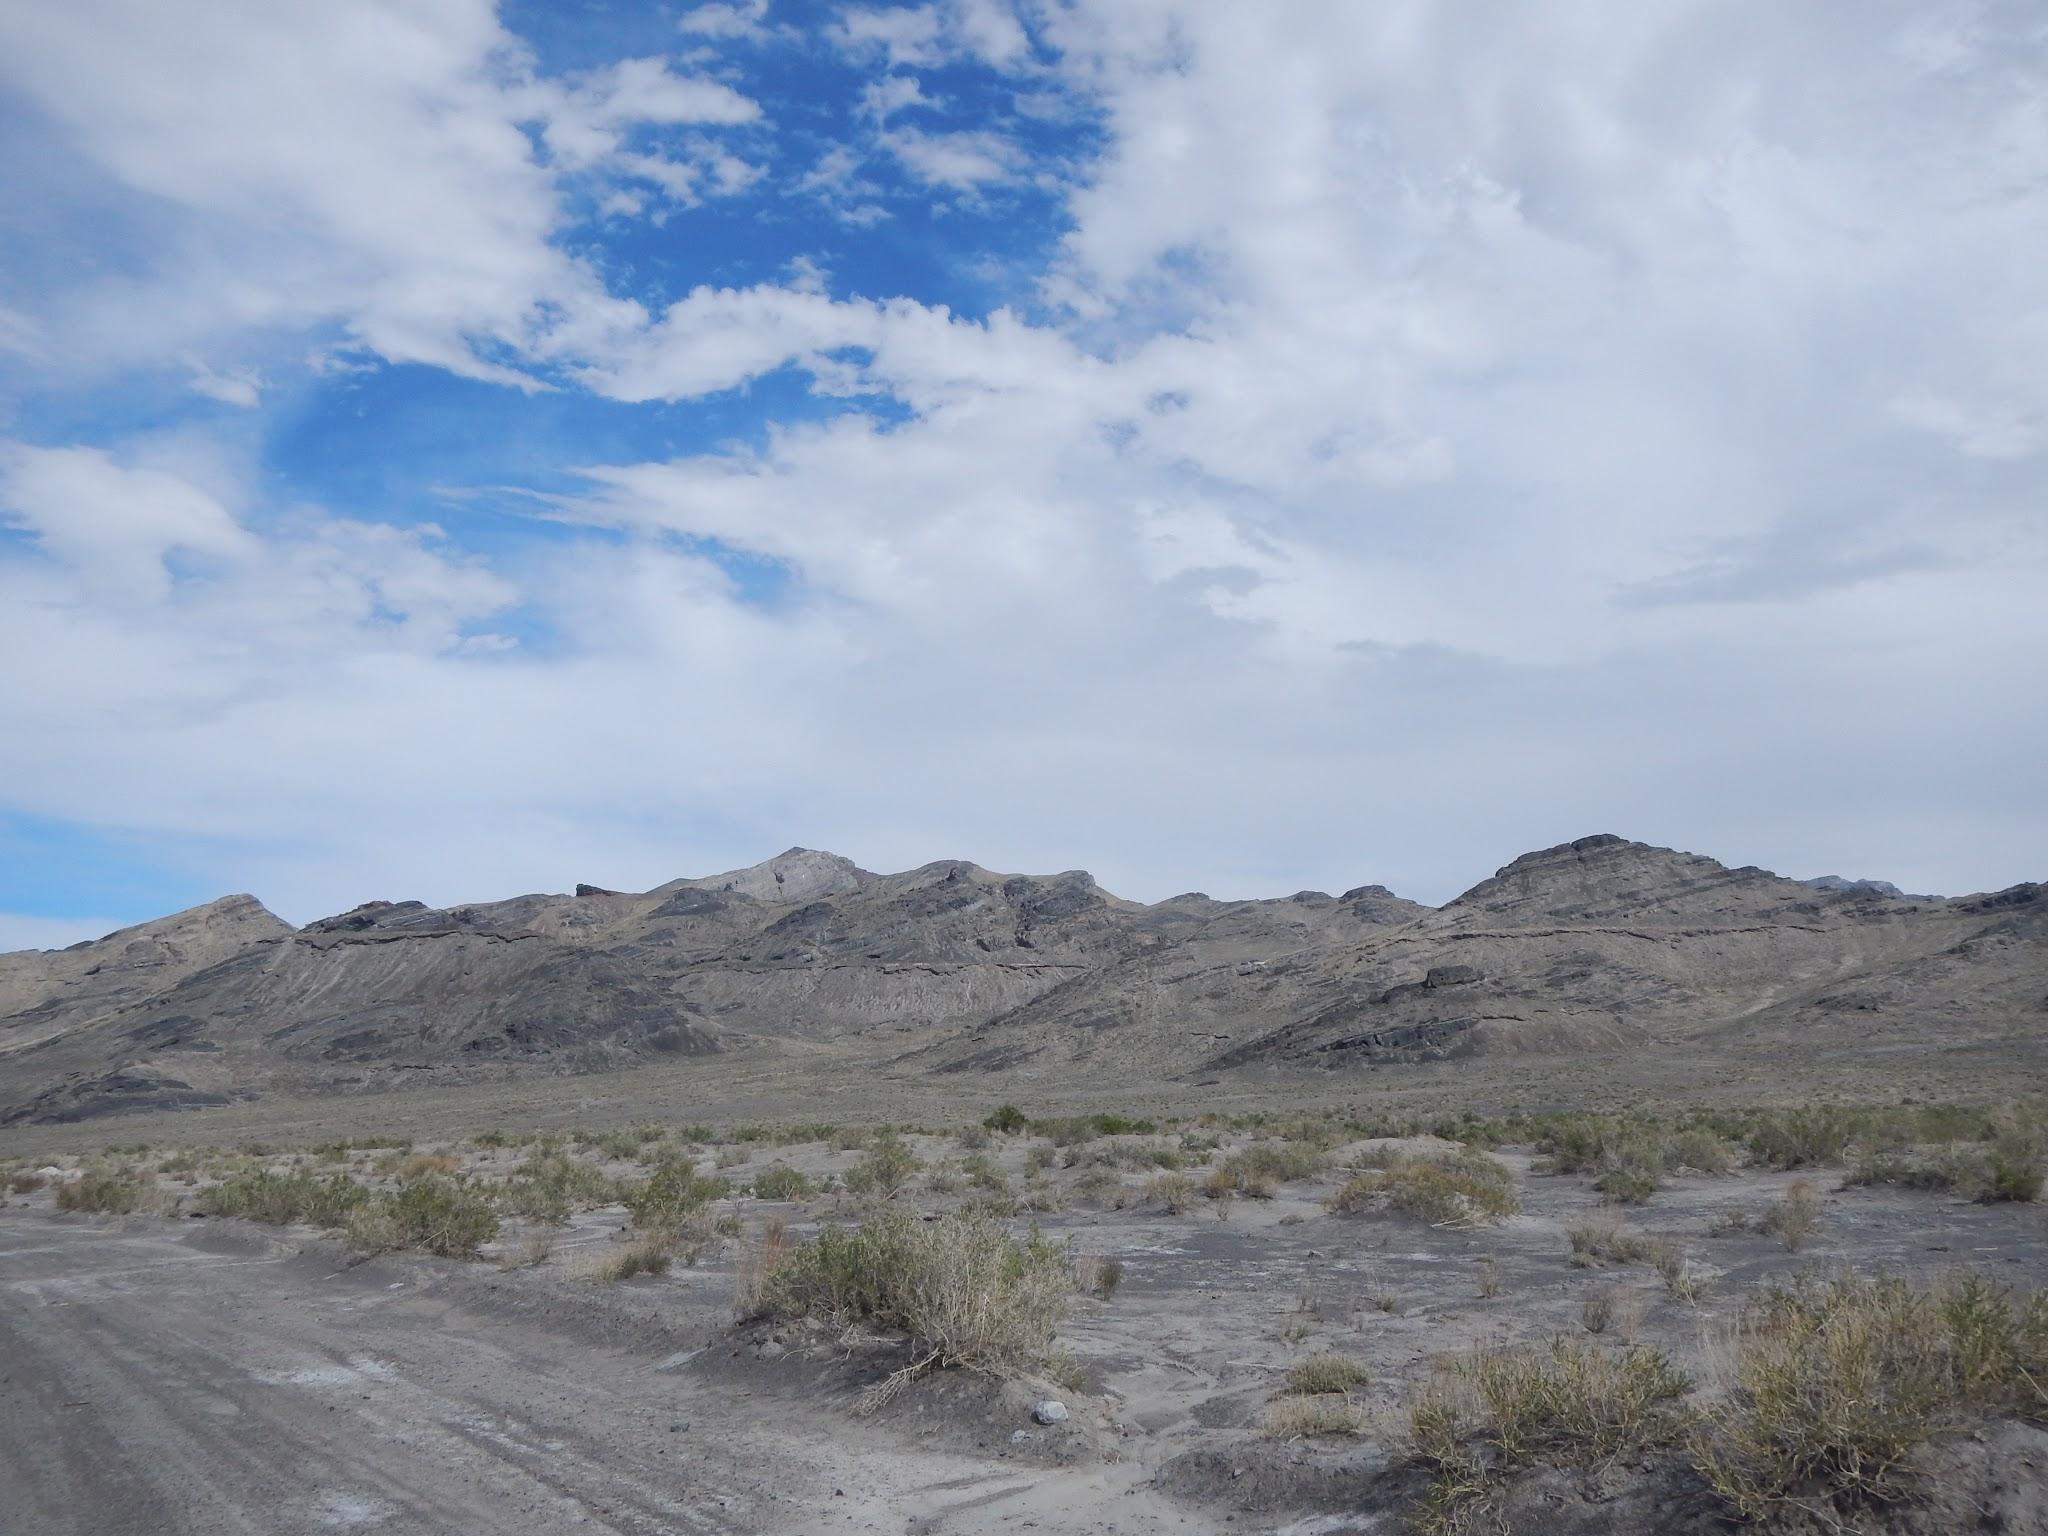 Photo: The Silver Island Mountains